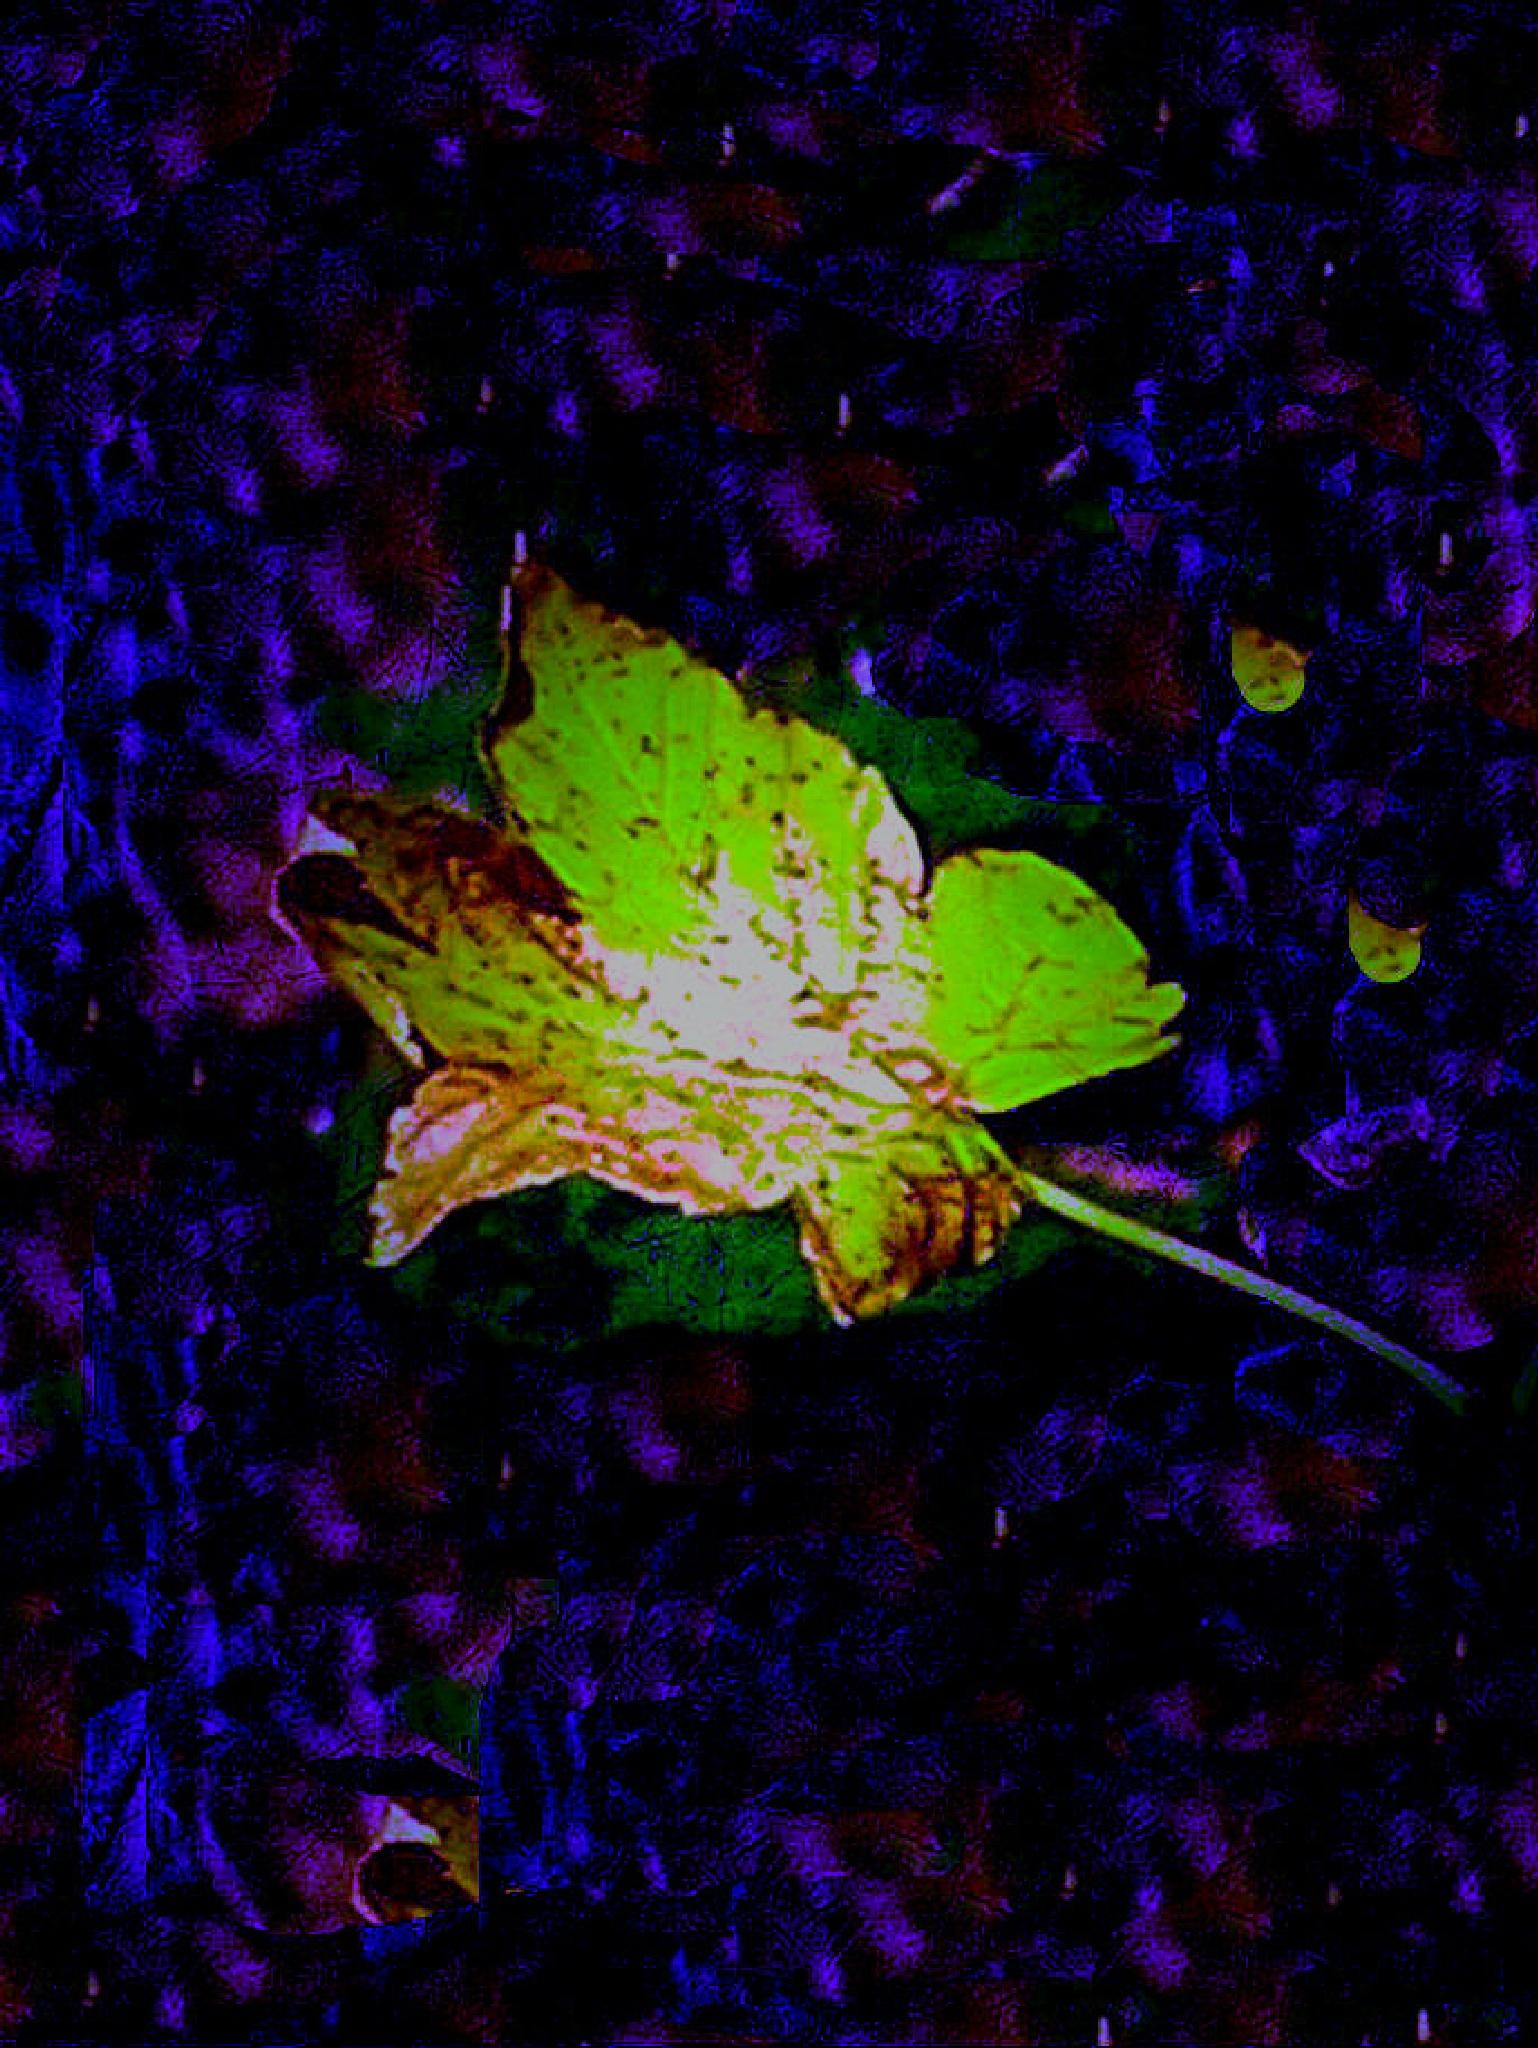 Autumn/Winter by Rudy Tarrazona Guacena